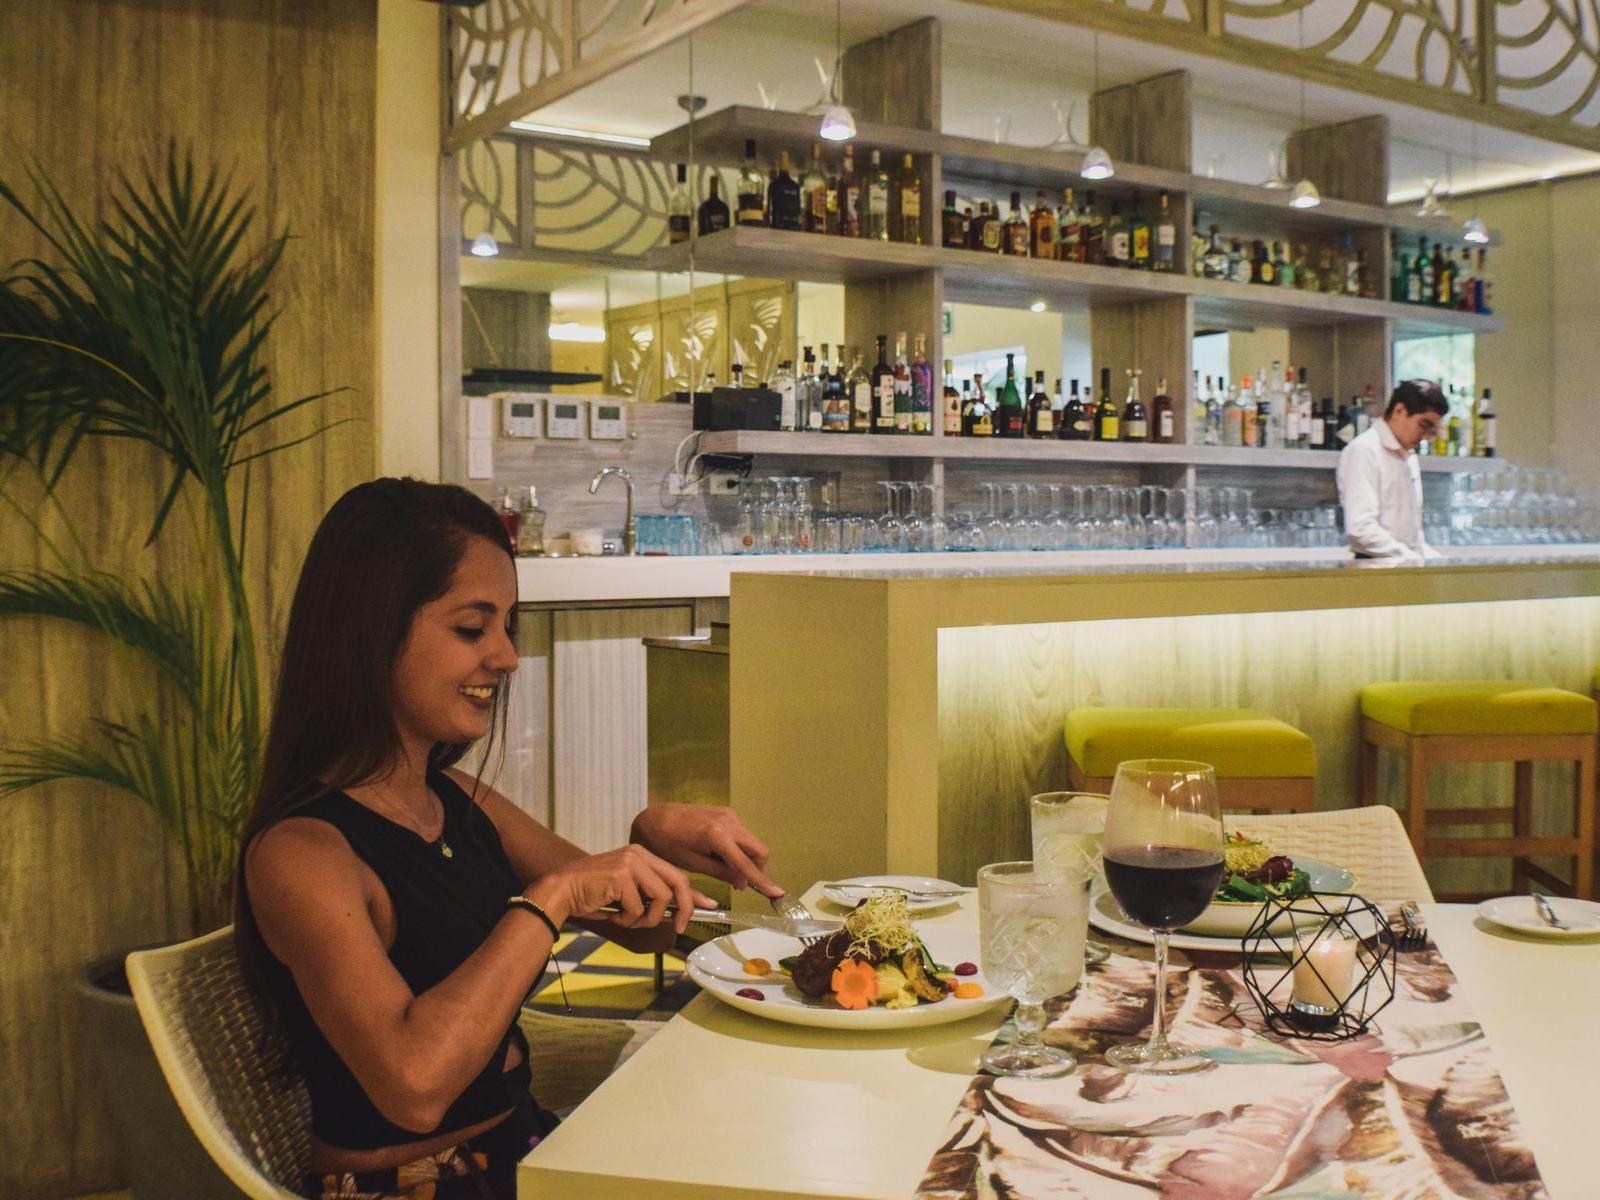 Woman having dinner